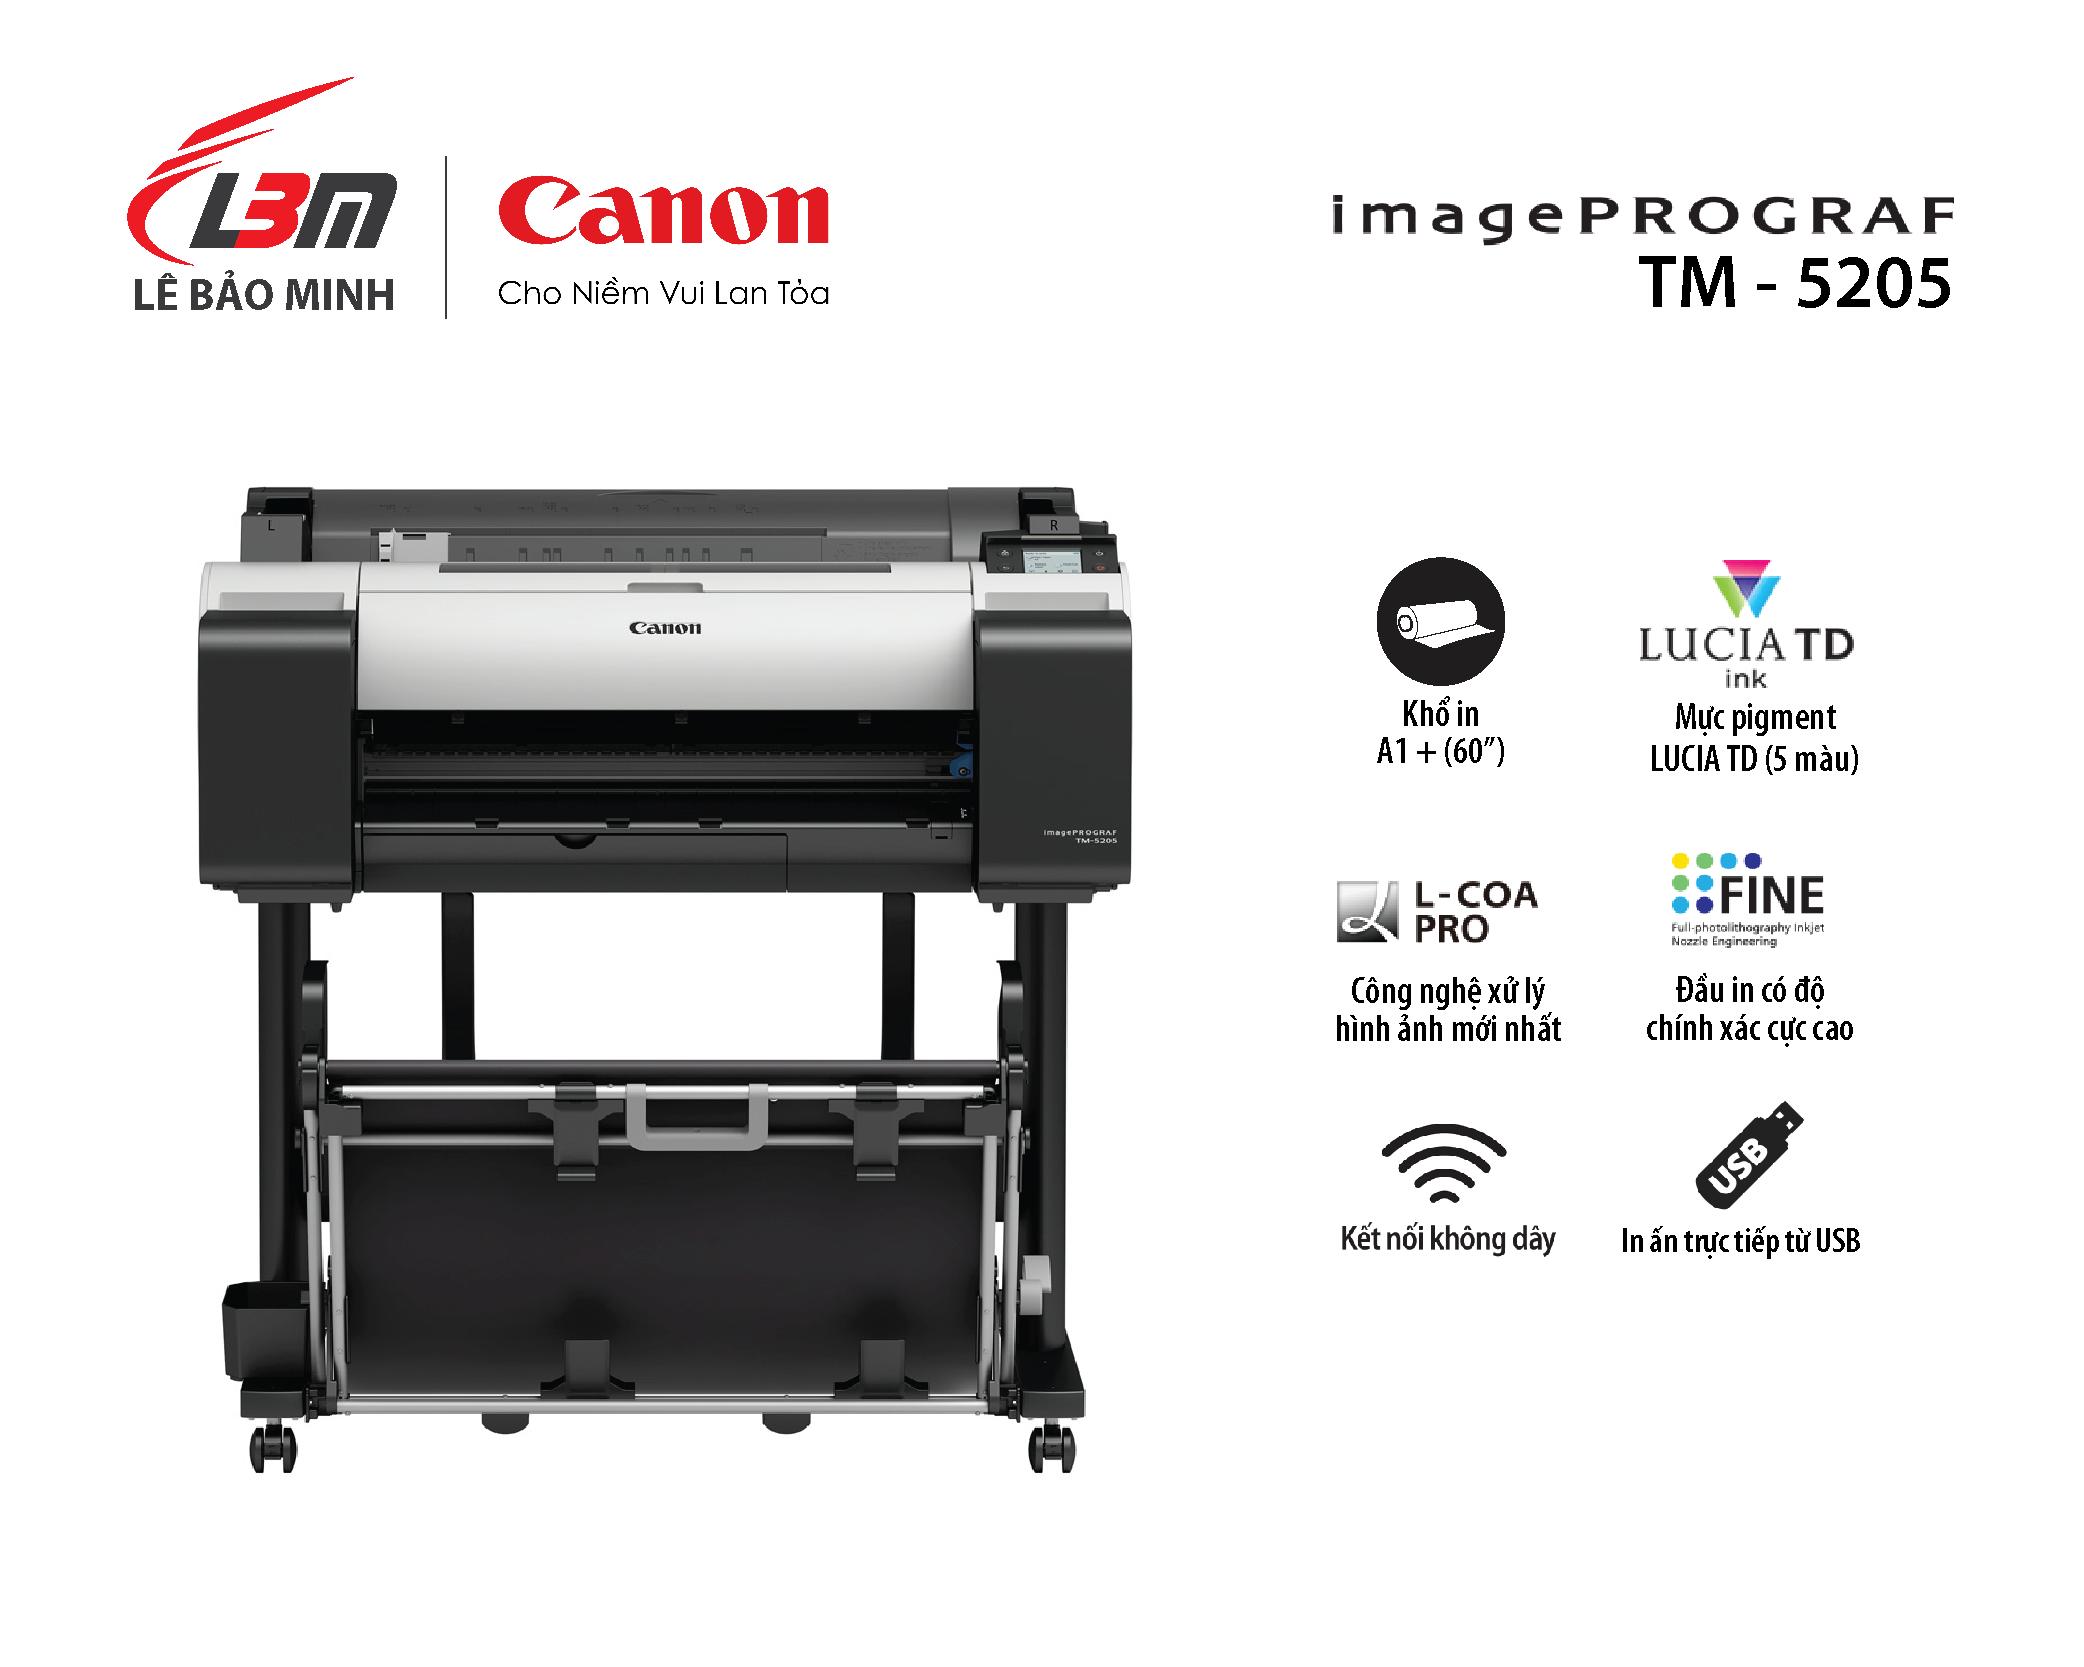 imagePROGRAF TM-5205 (5 màu mực)